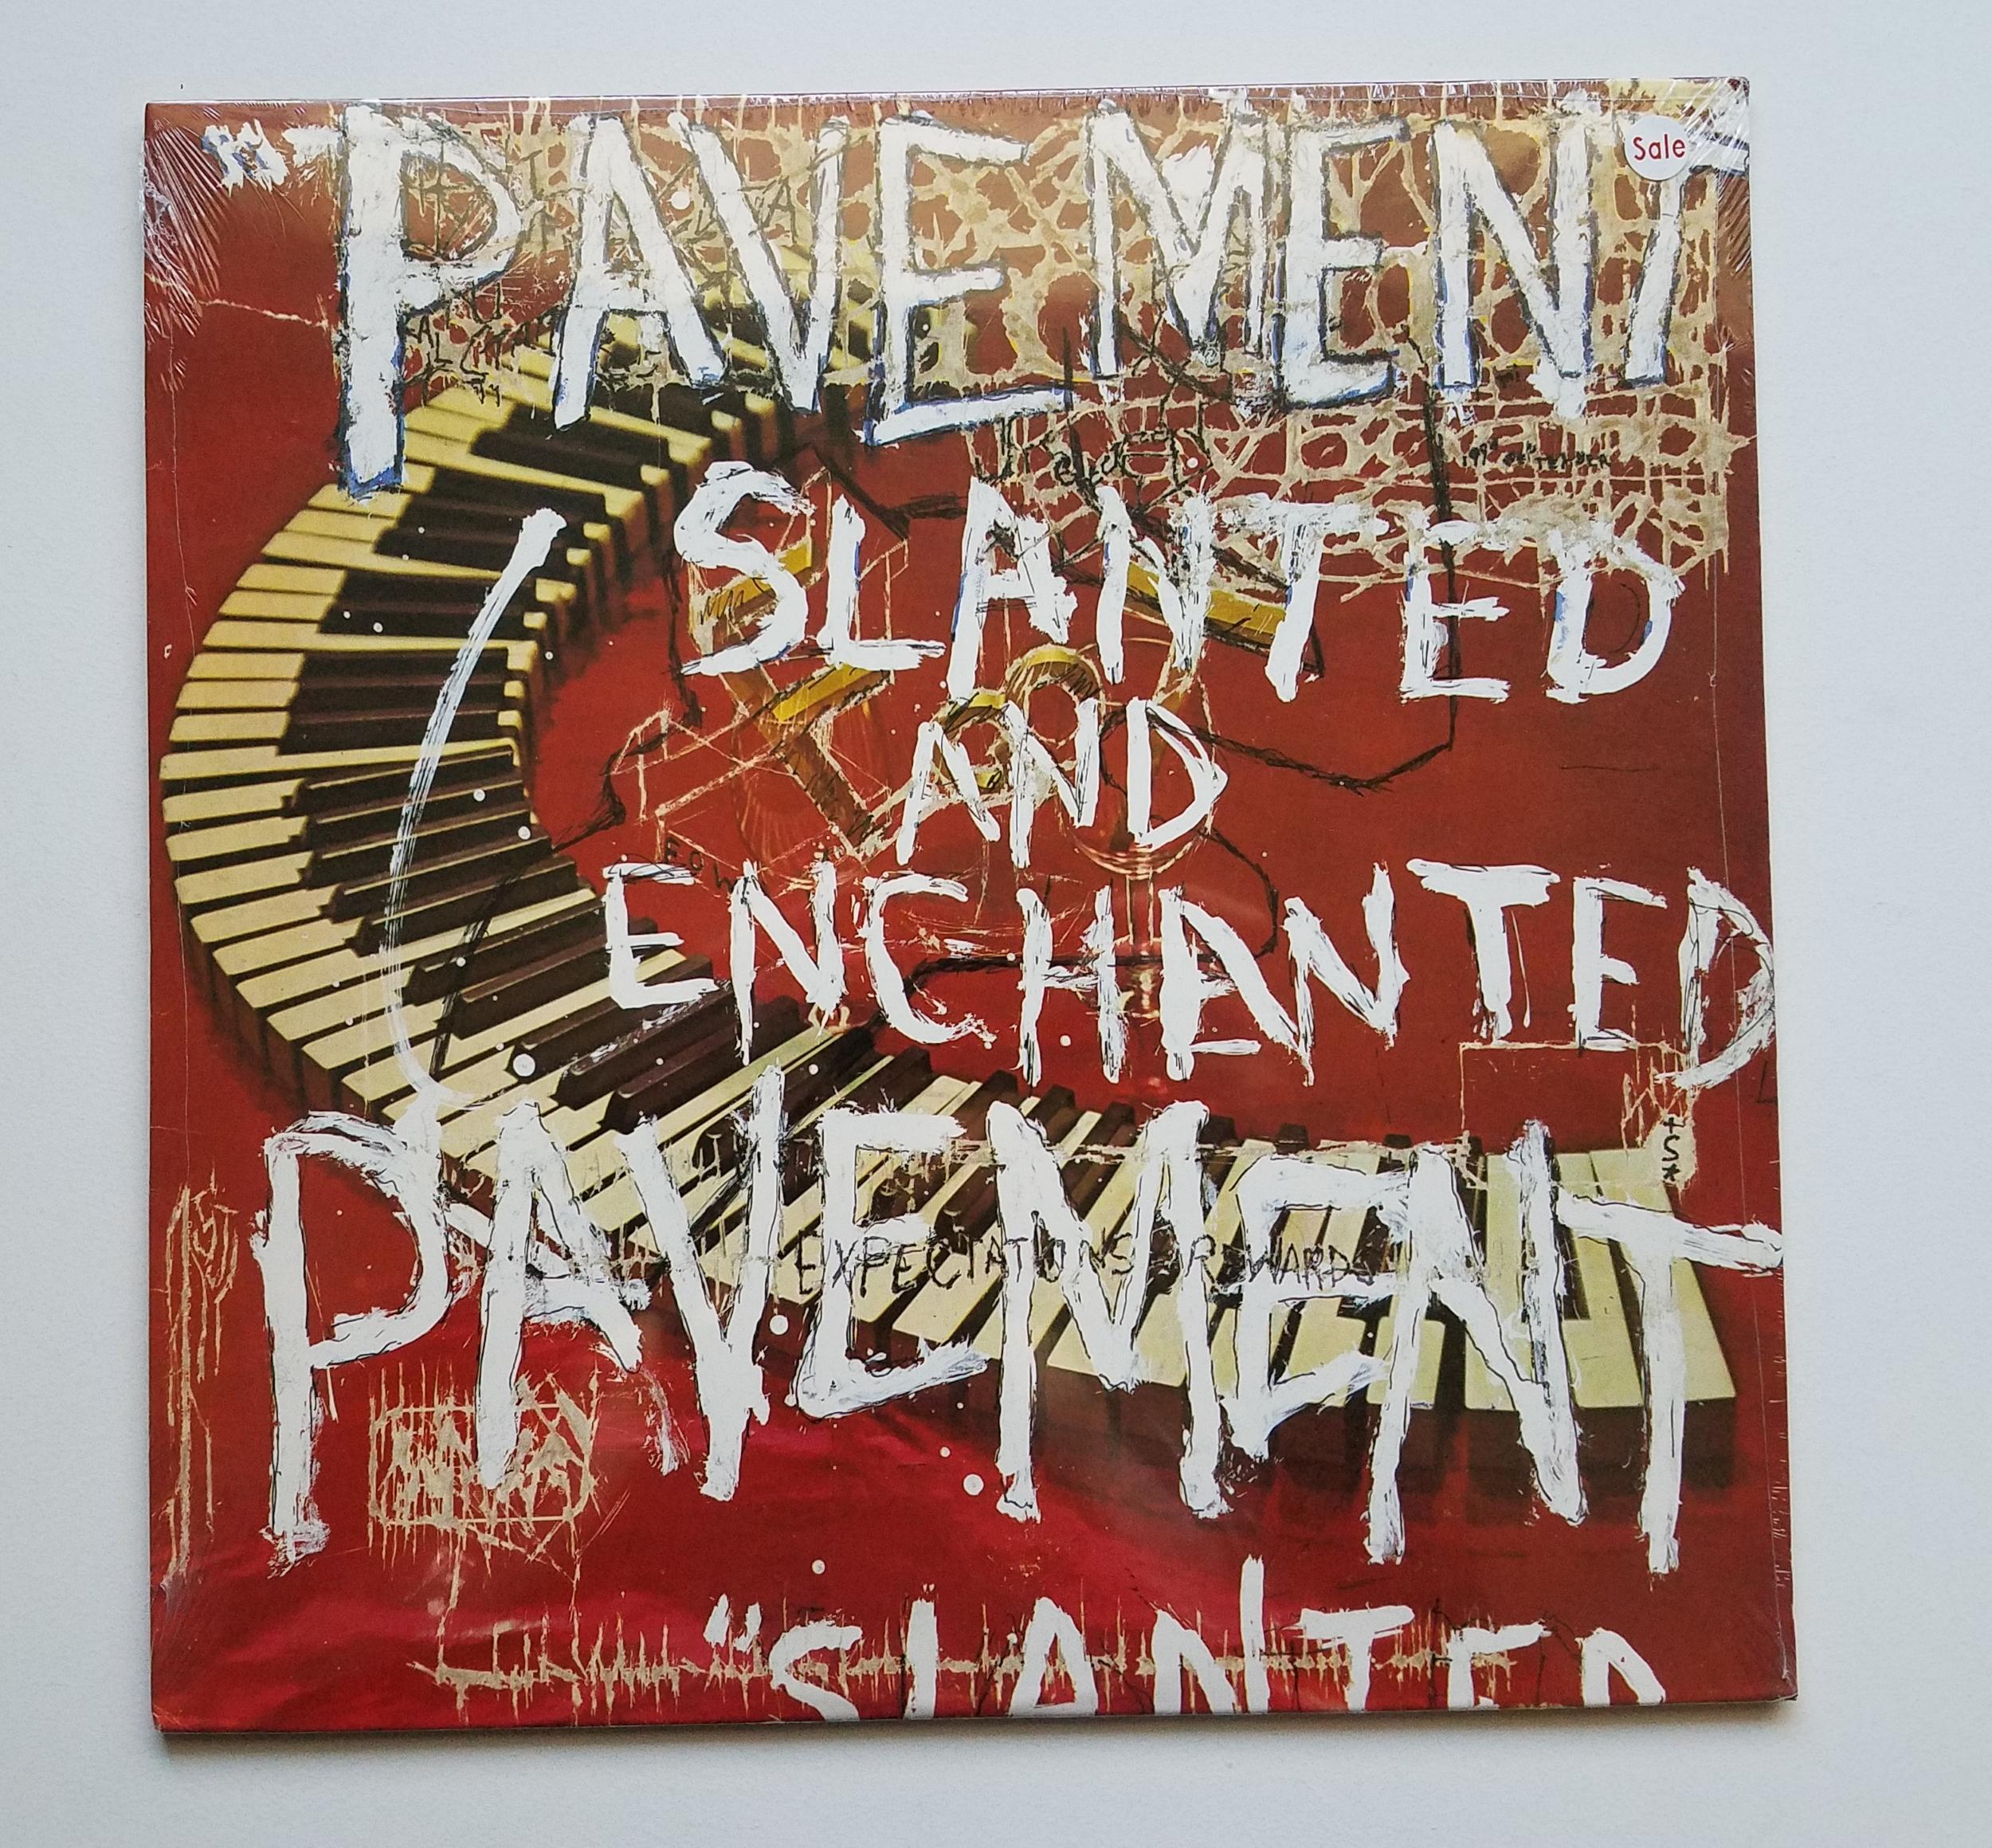 Pavement -